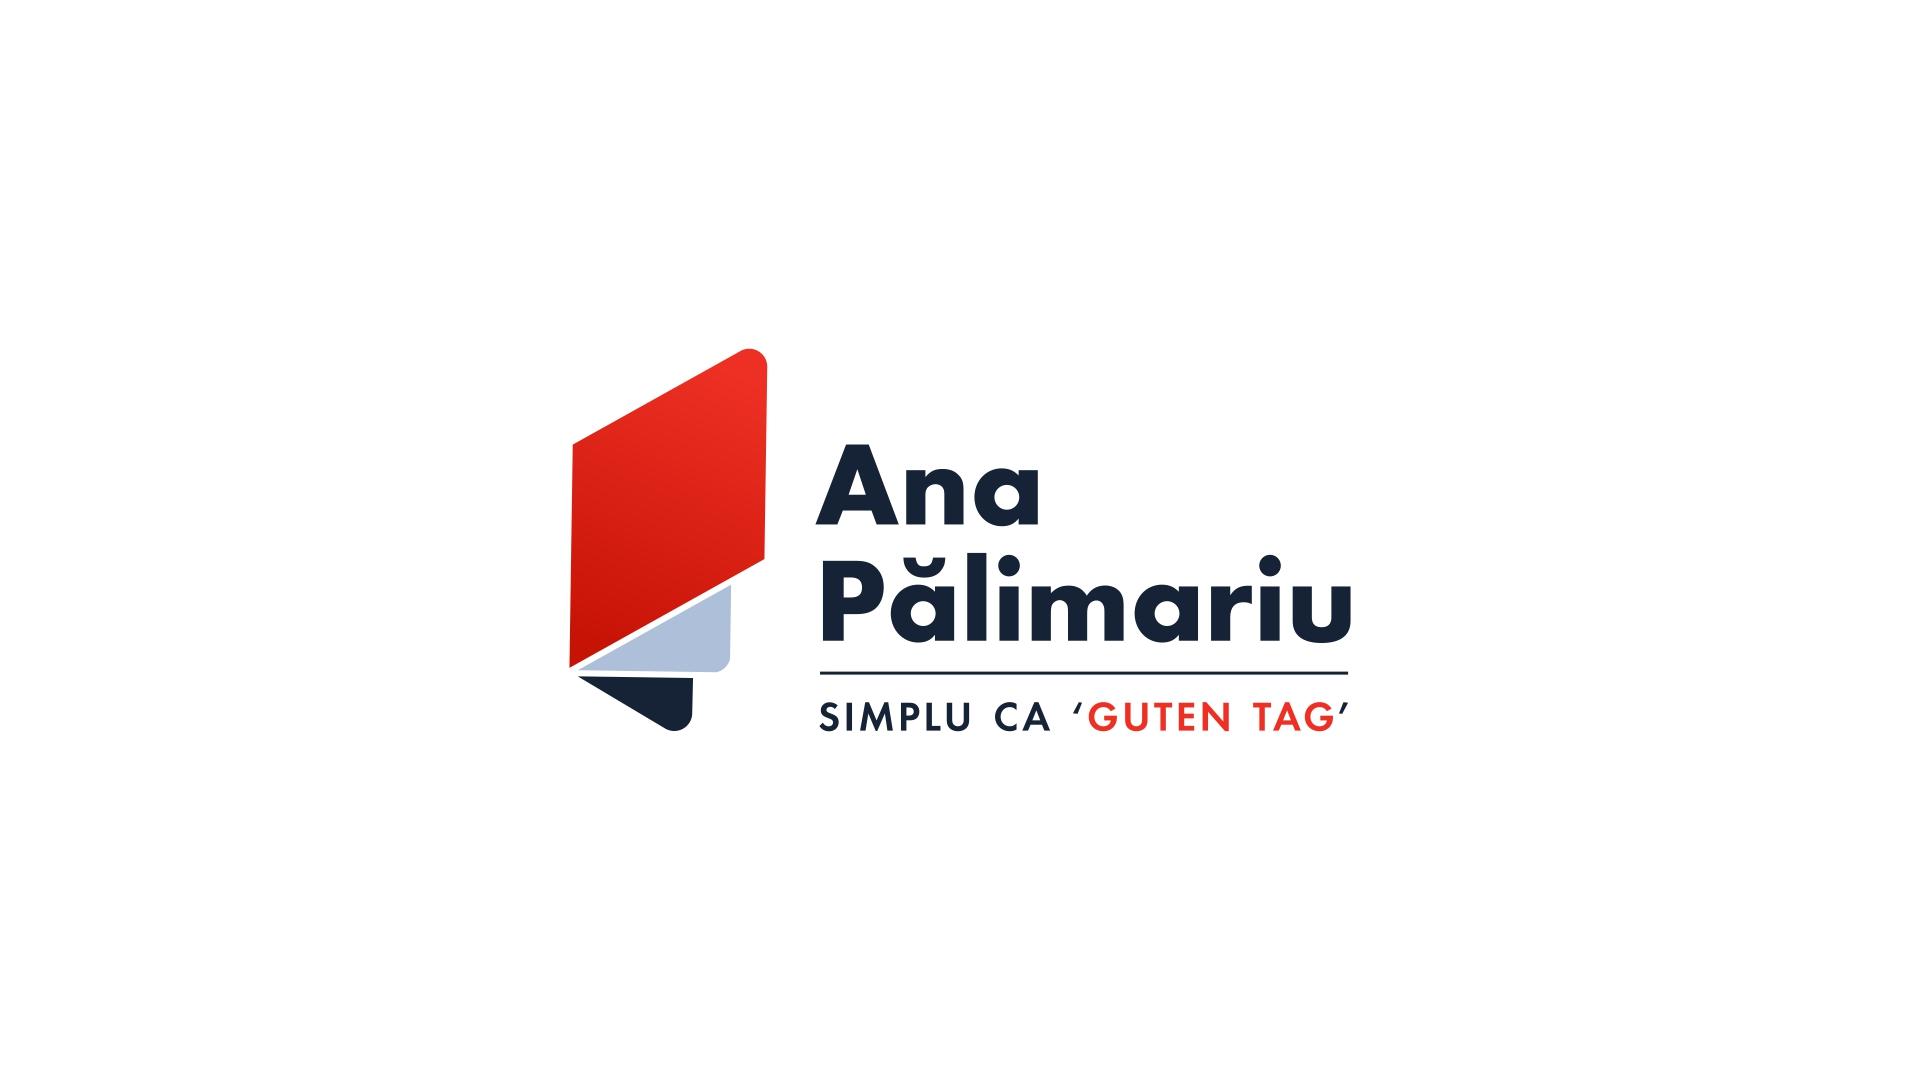 Palimariu Ana Maria Persoana Fizica Autorizata